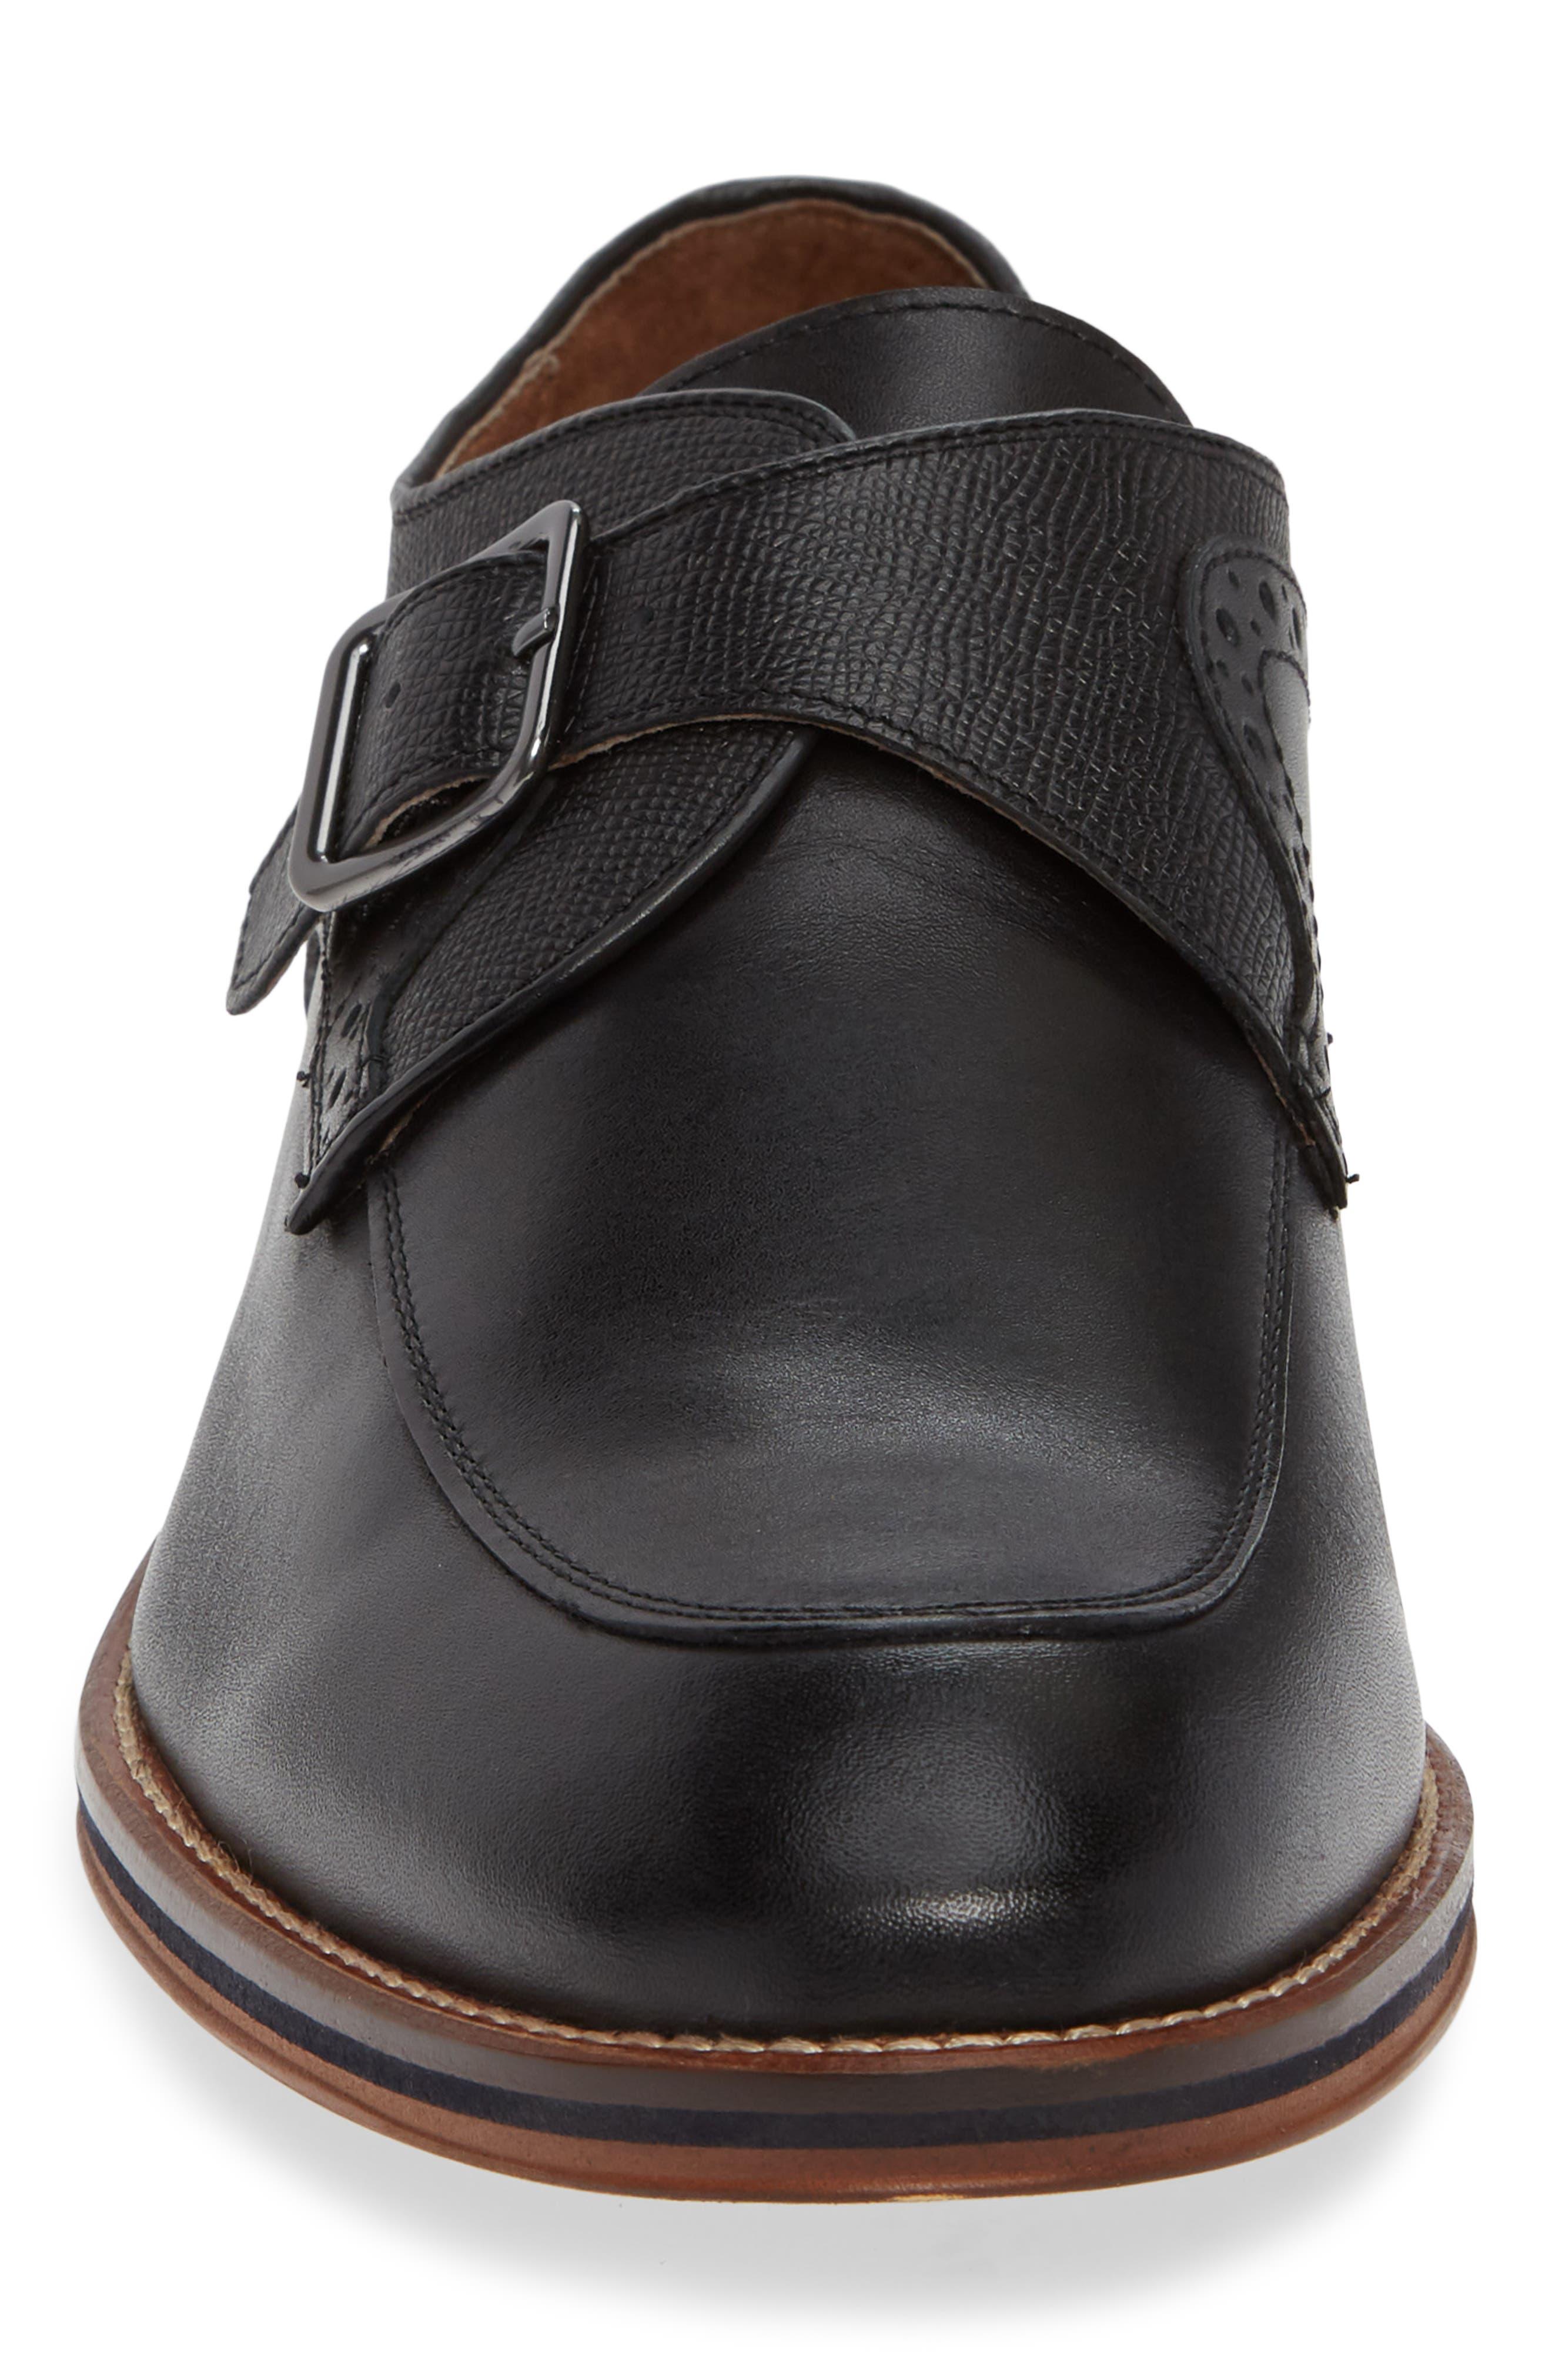 Conard Monk Strap Shoe,                             Alternate thumbnail 4, color,                             BLACK LEATHER